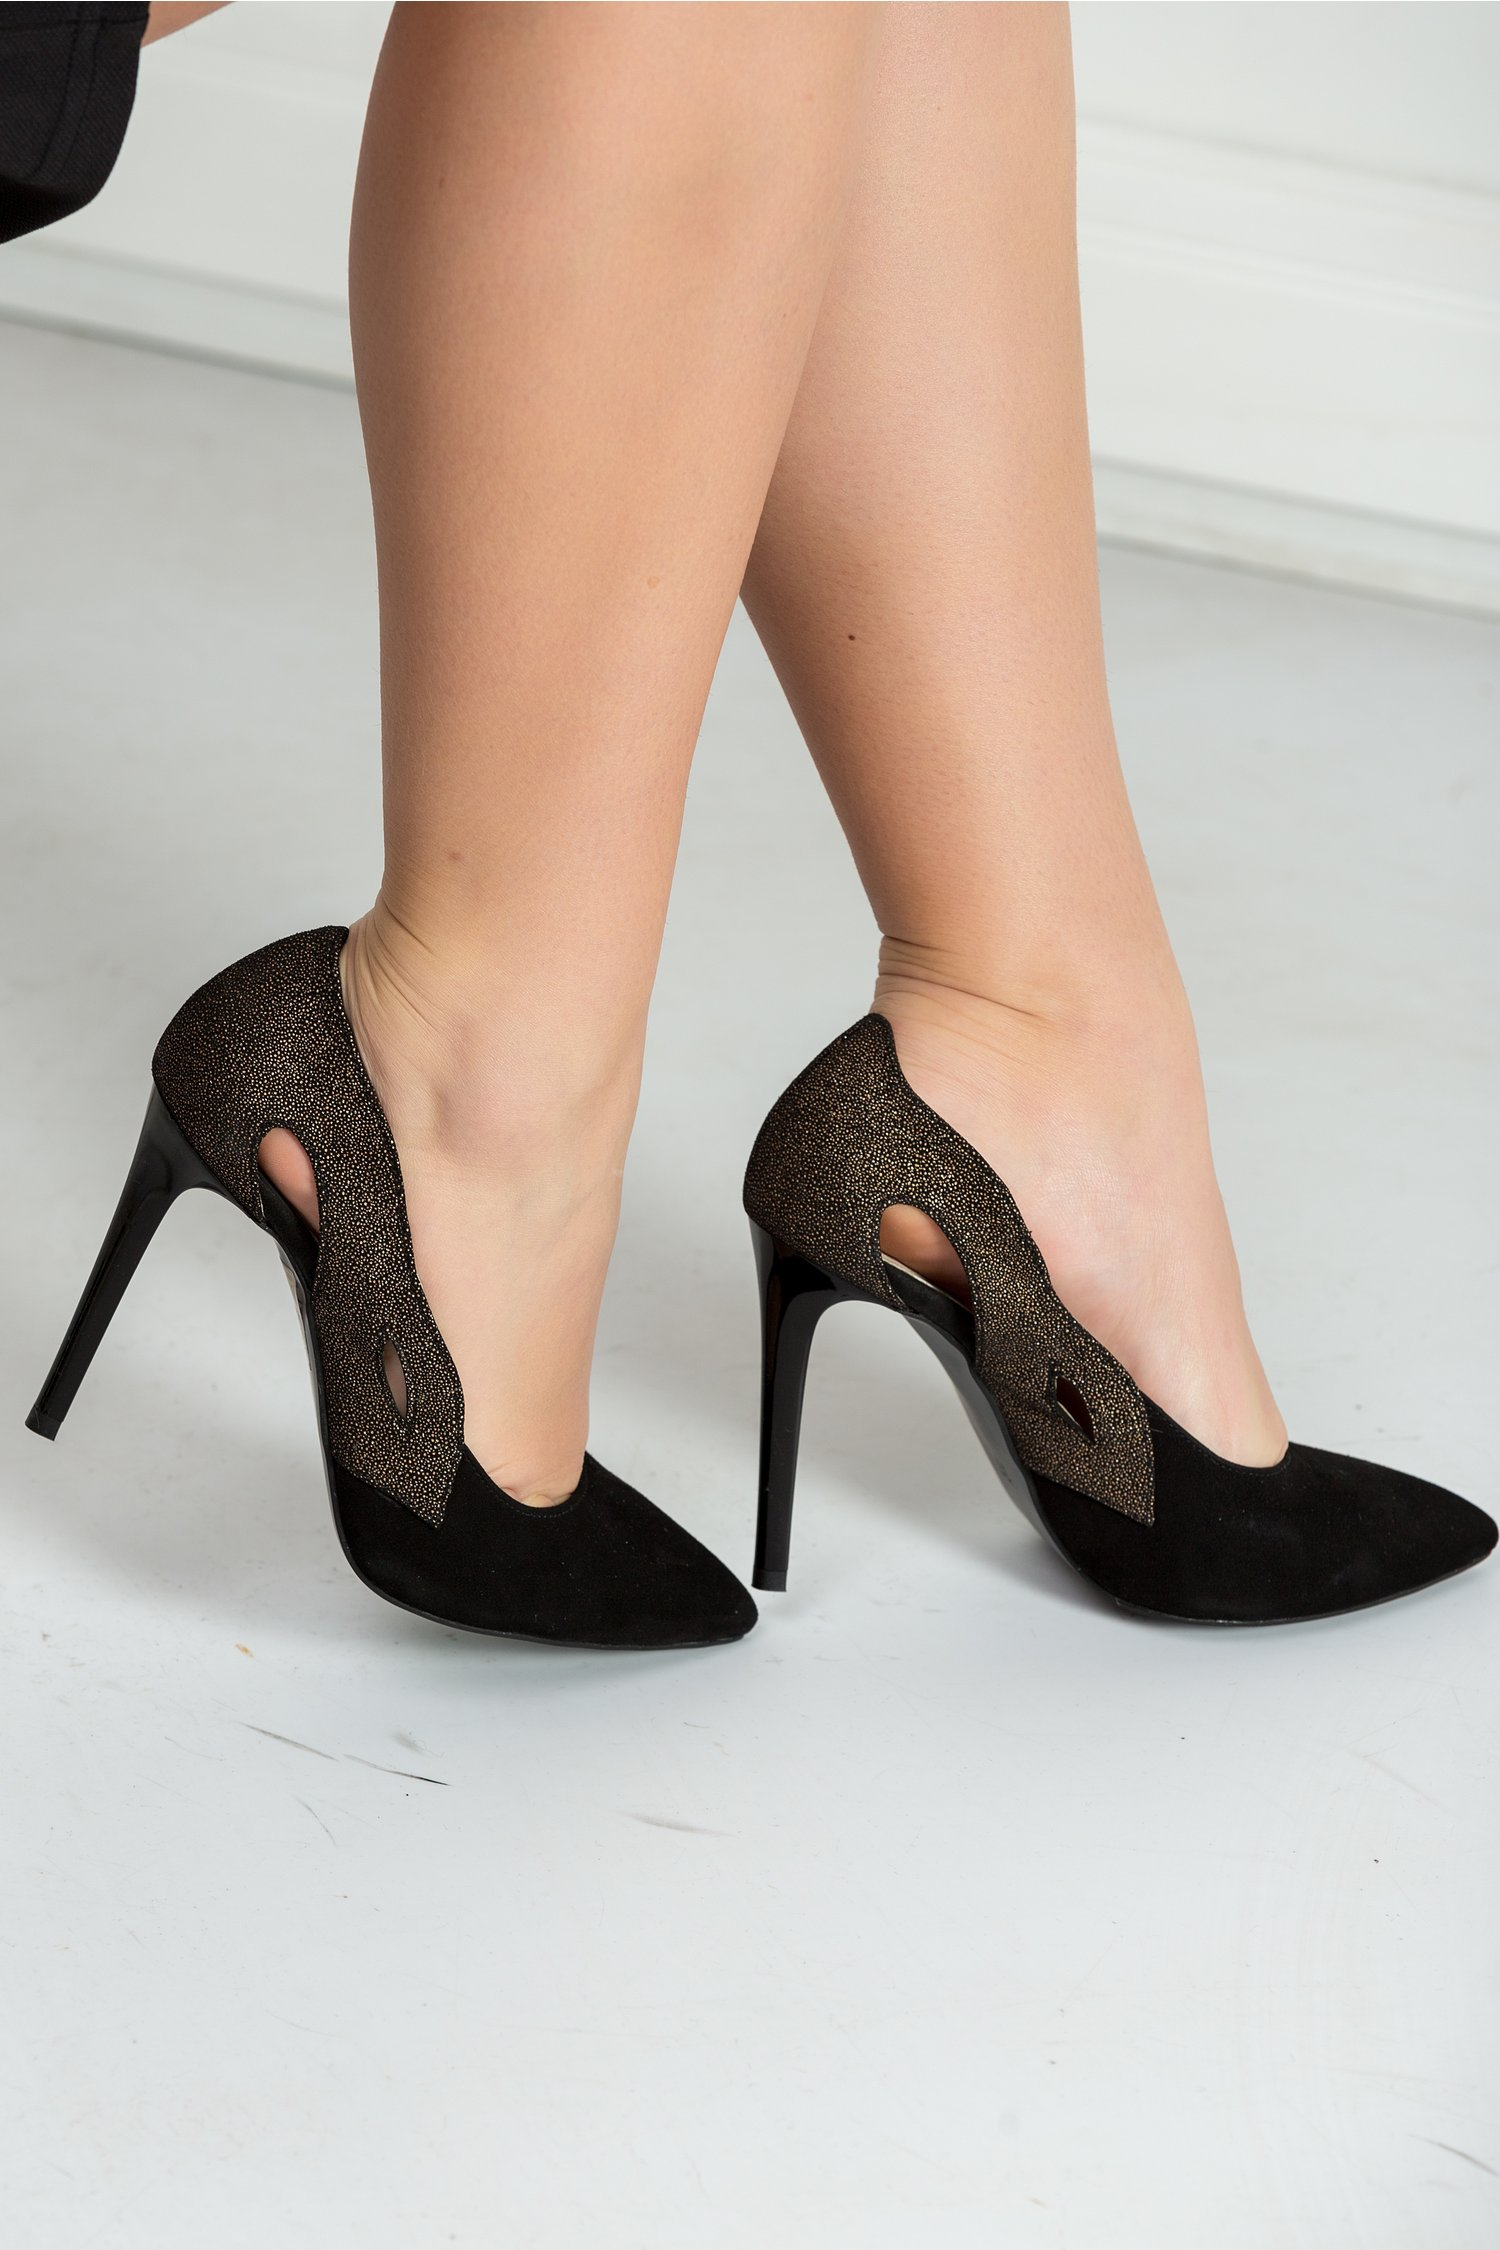 Pantofi Alice stiletto negri cu decupaje